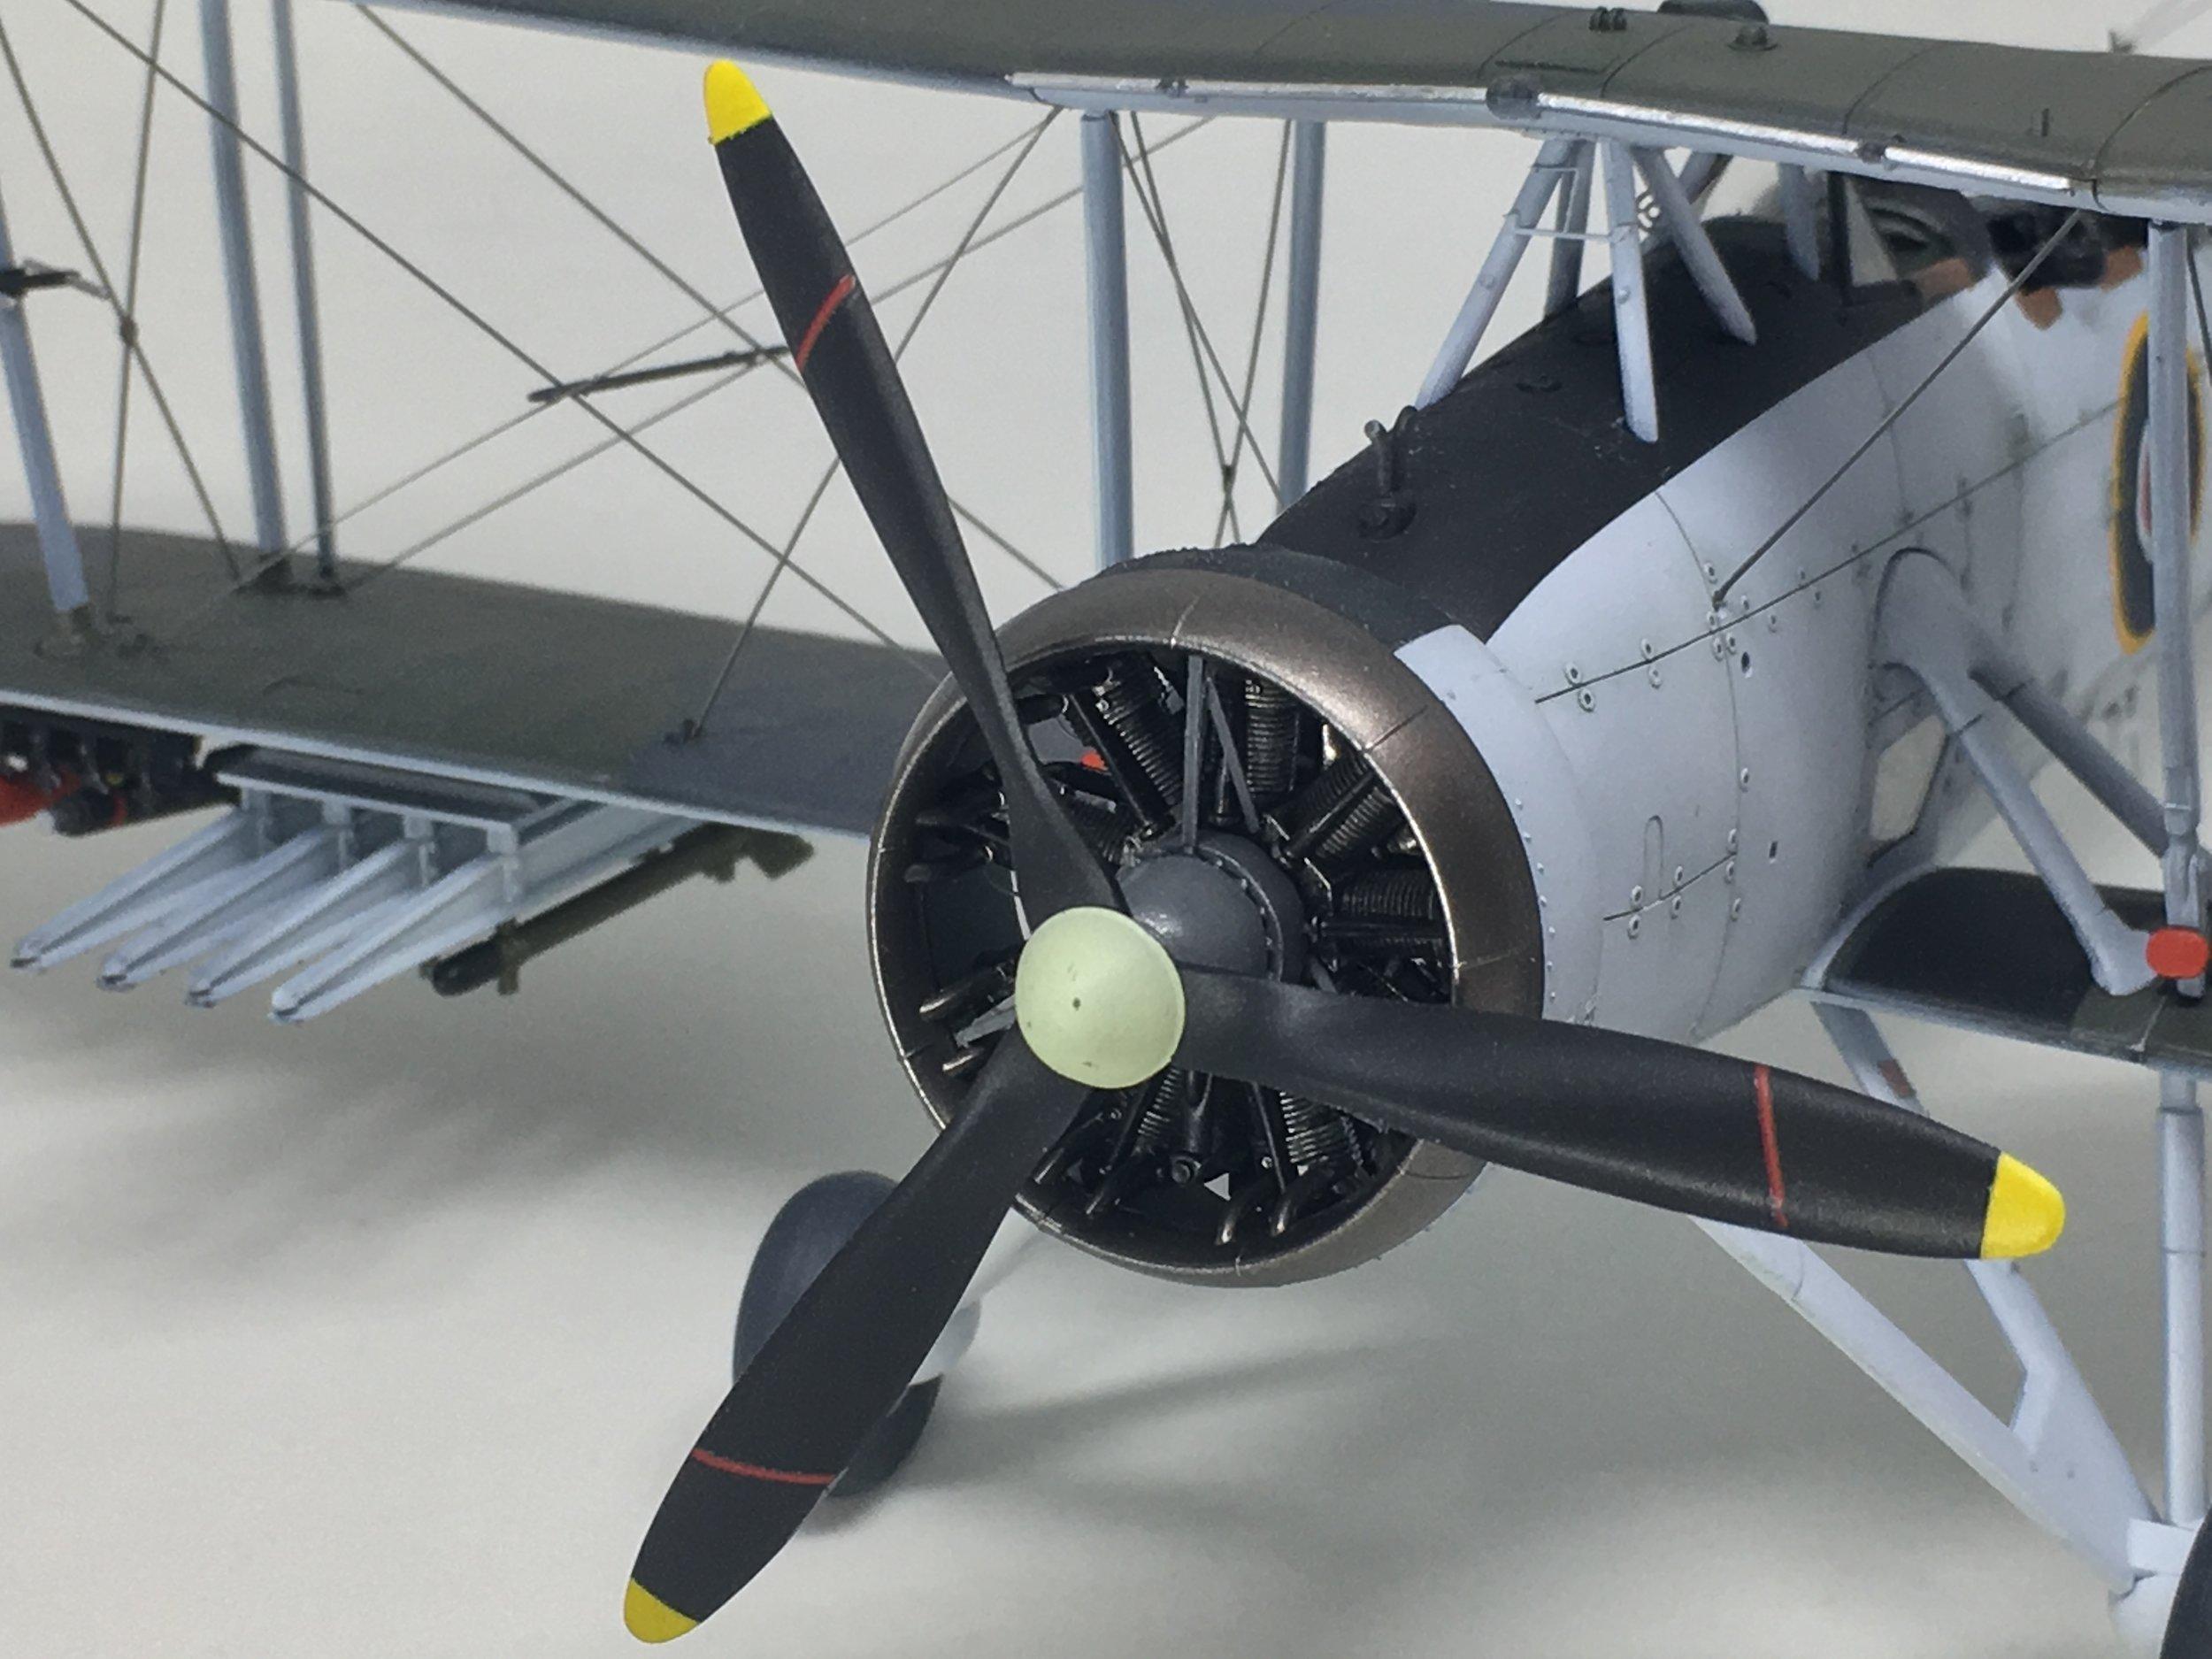 QFairley Swordfish MK.2 Anders quigg Tamiya - 1/48